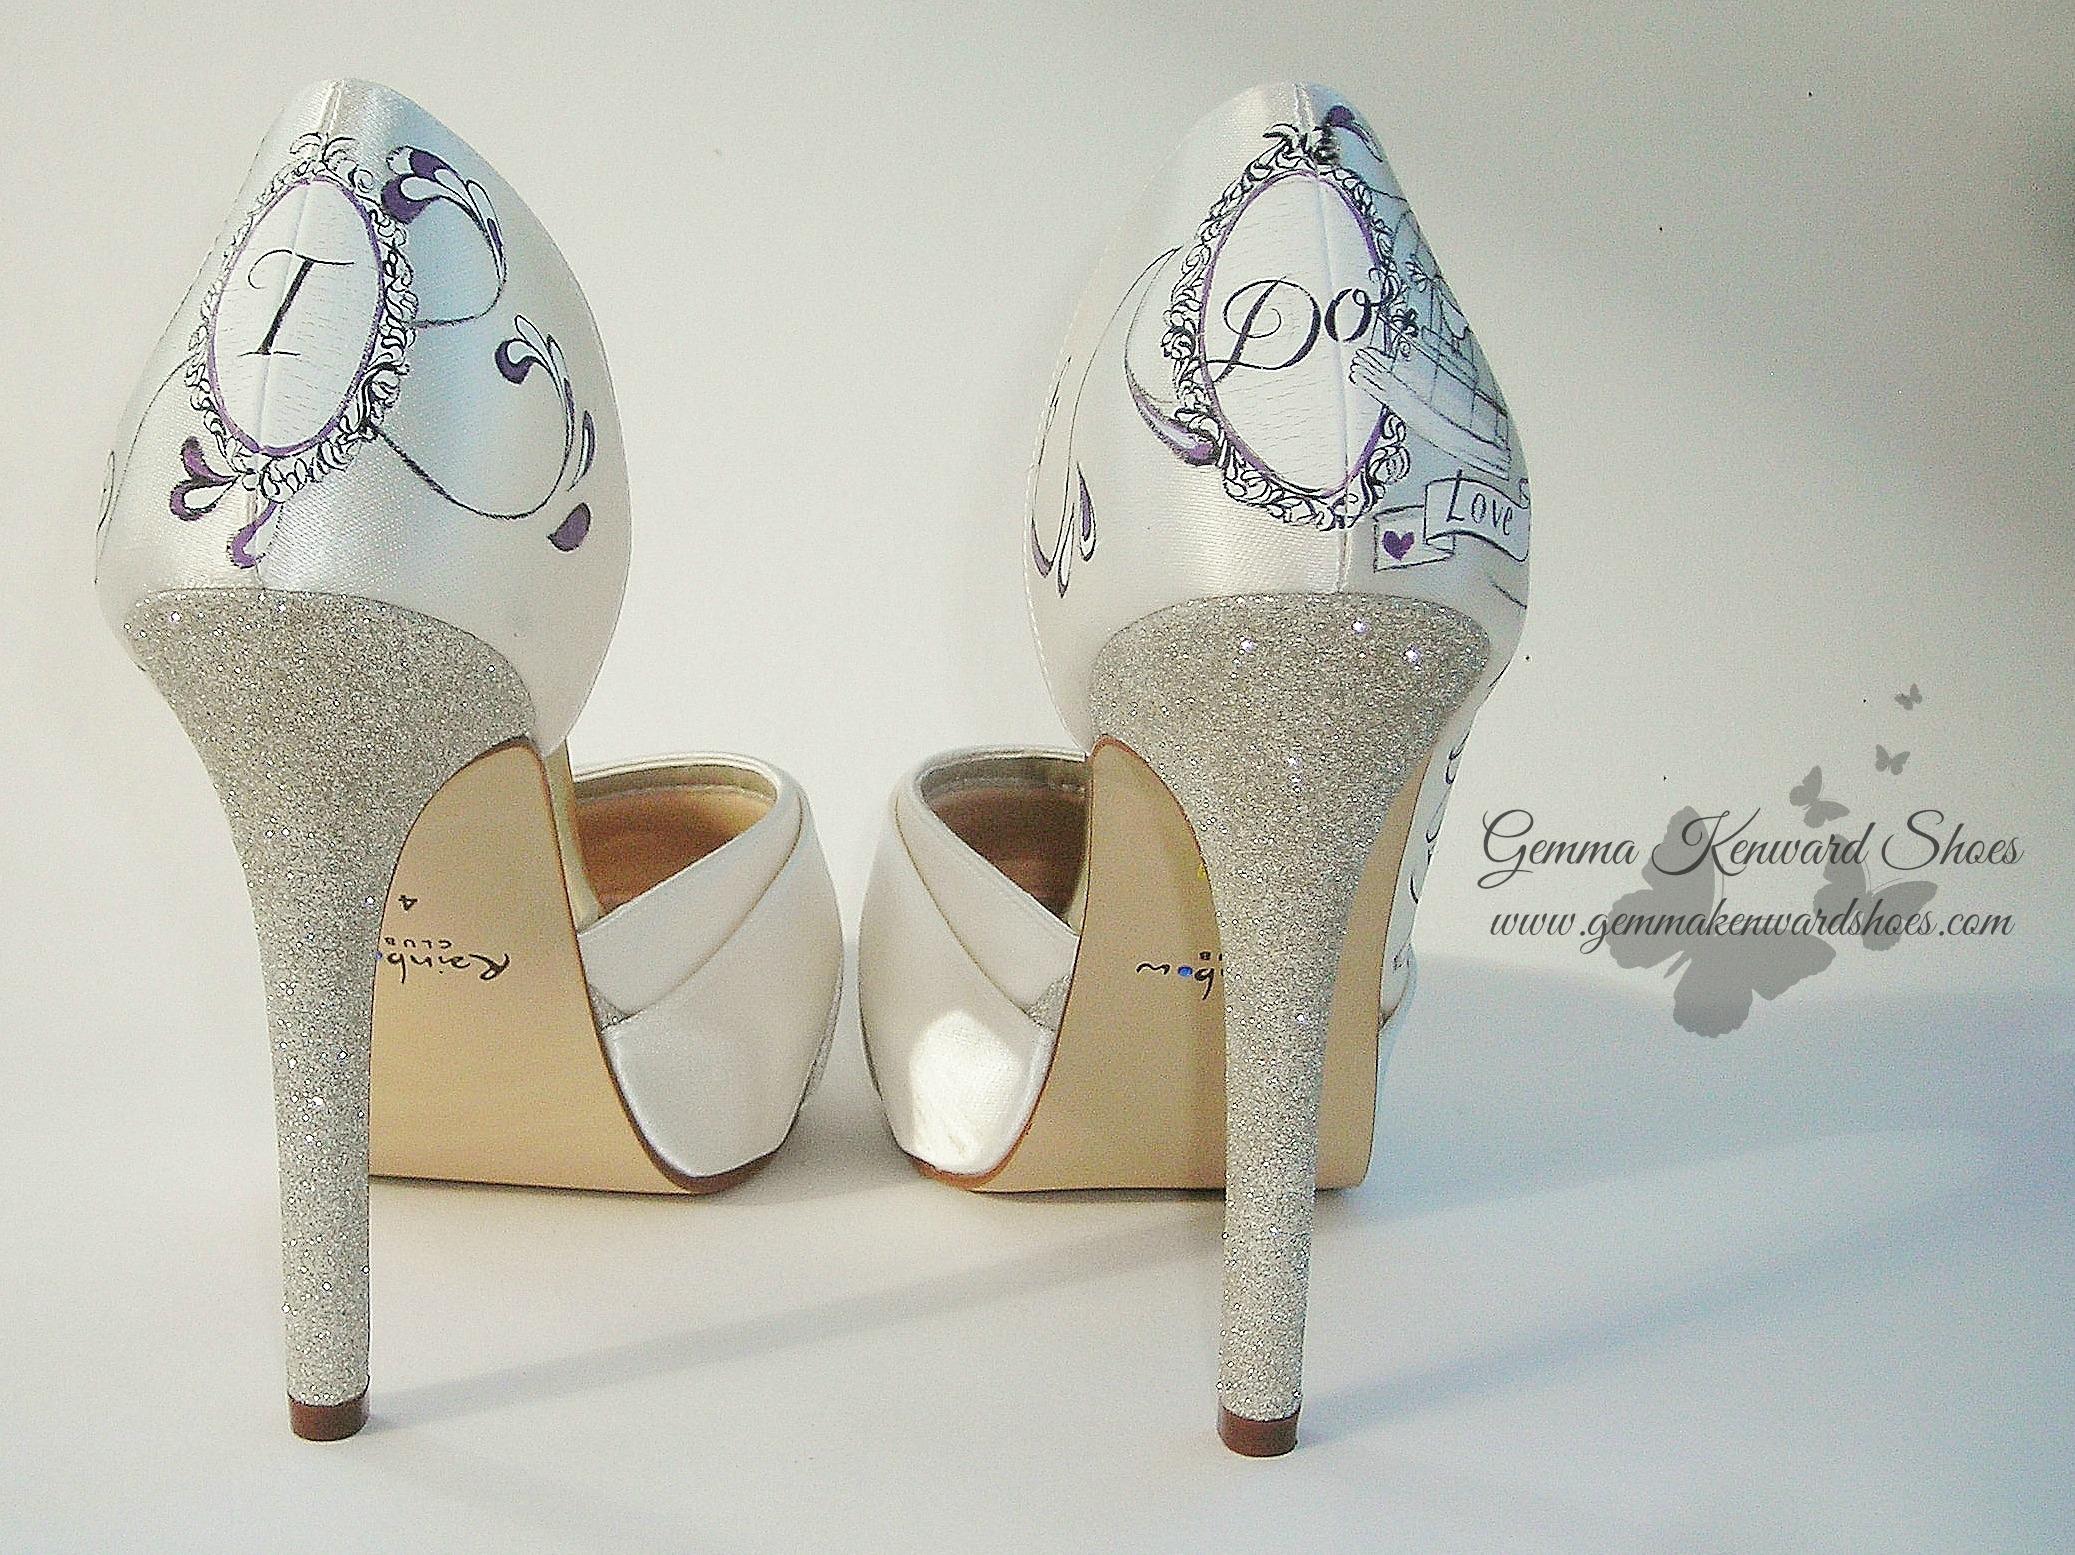 I Do hand painted wedding shoes.JPG